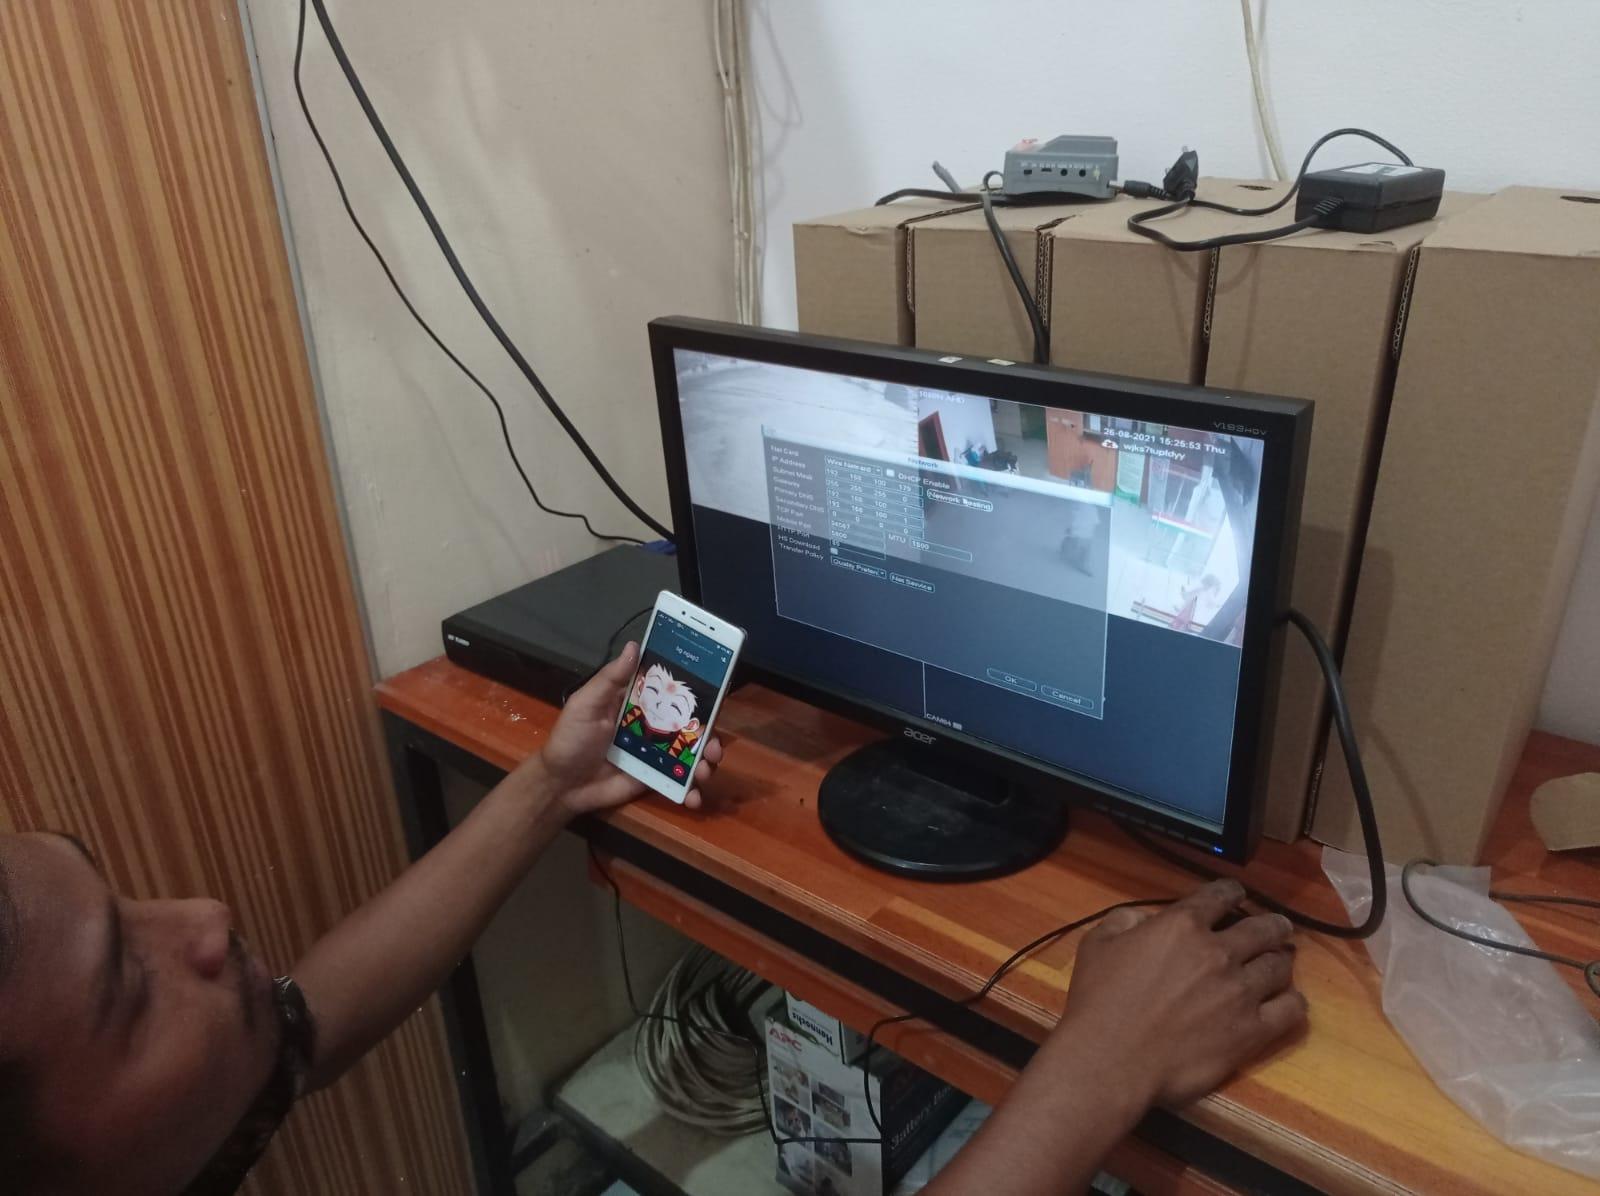 PERBAIKAN KONEKSI JARINGAN INTERNET DAN CCTV DI KECAMATAN AEK LEDONG